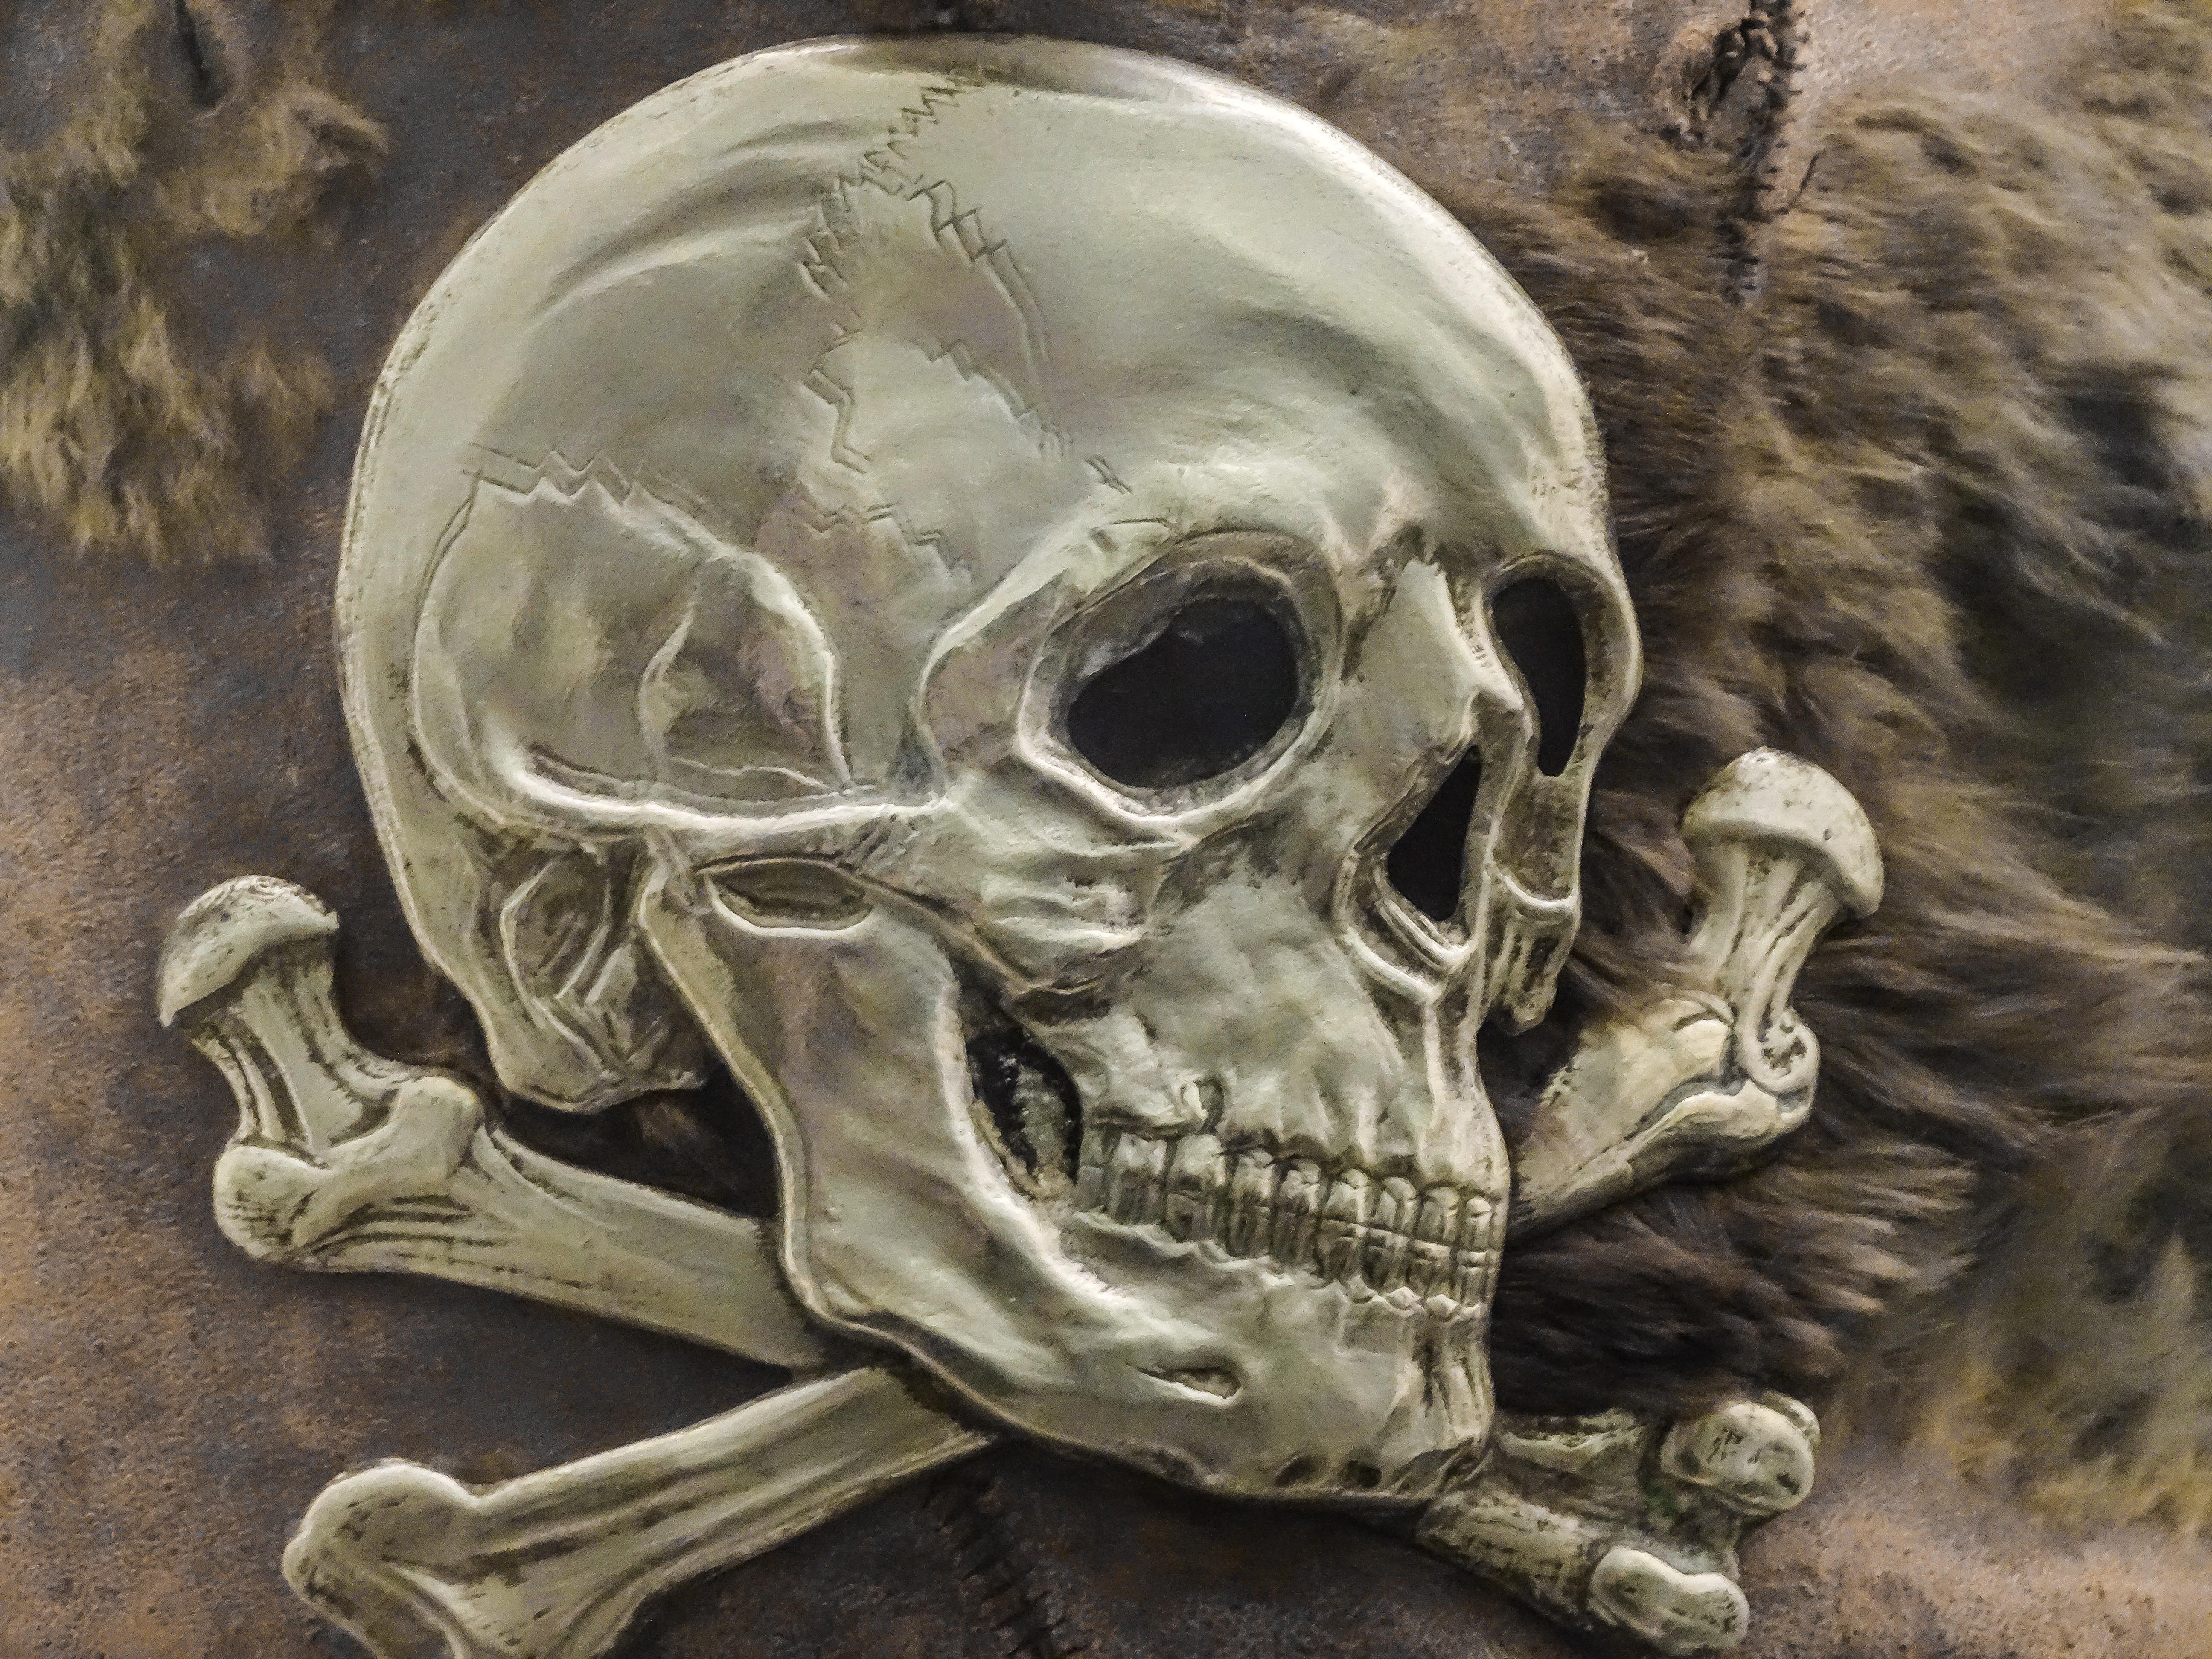 Free Images : death, skull, bone, painting, war, logo, skeleton